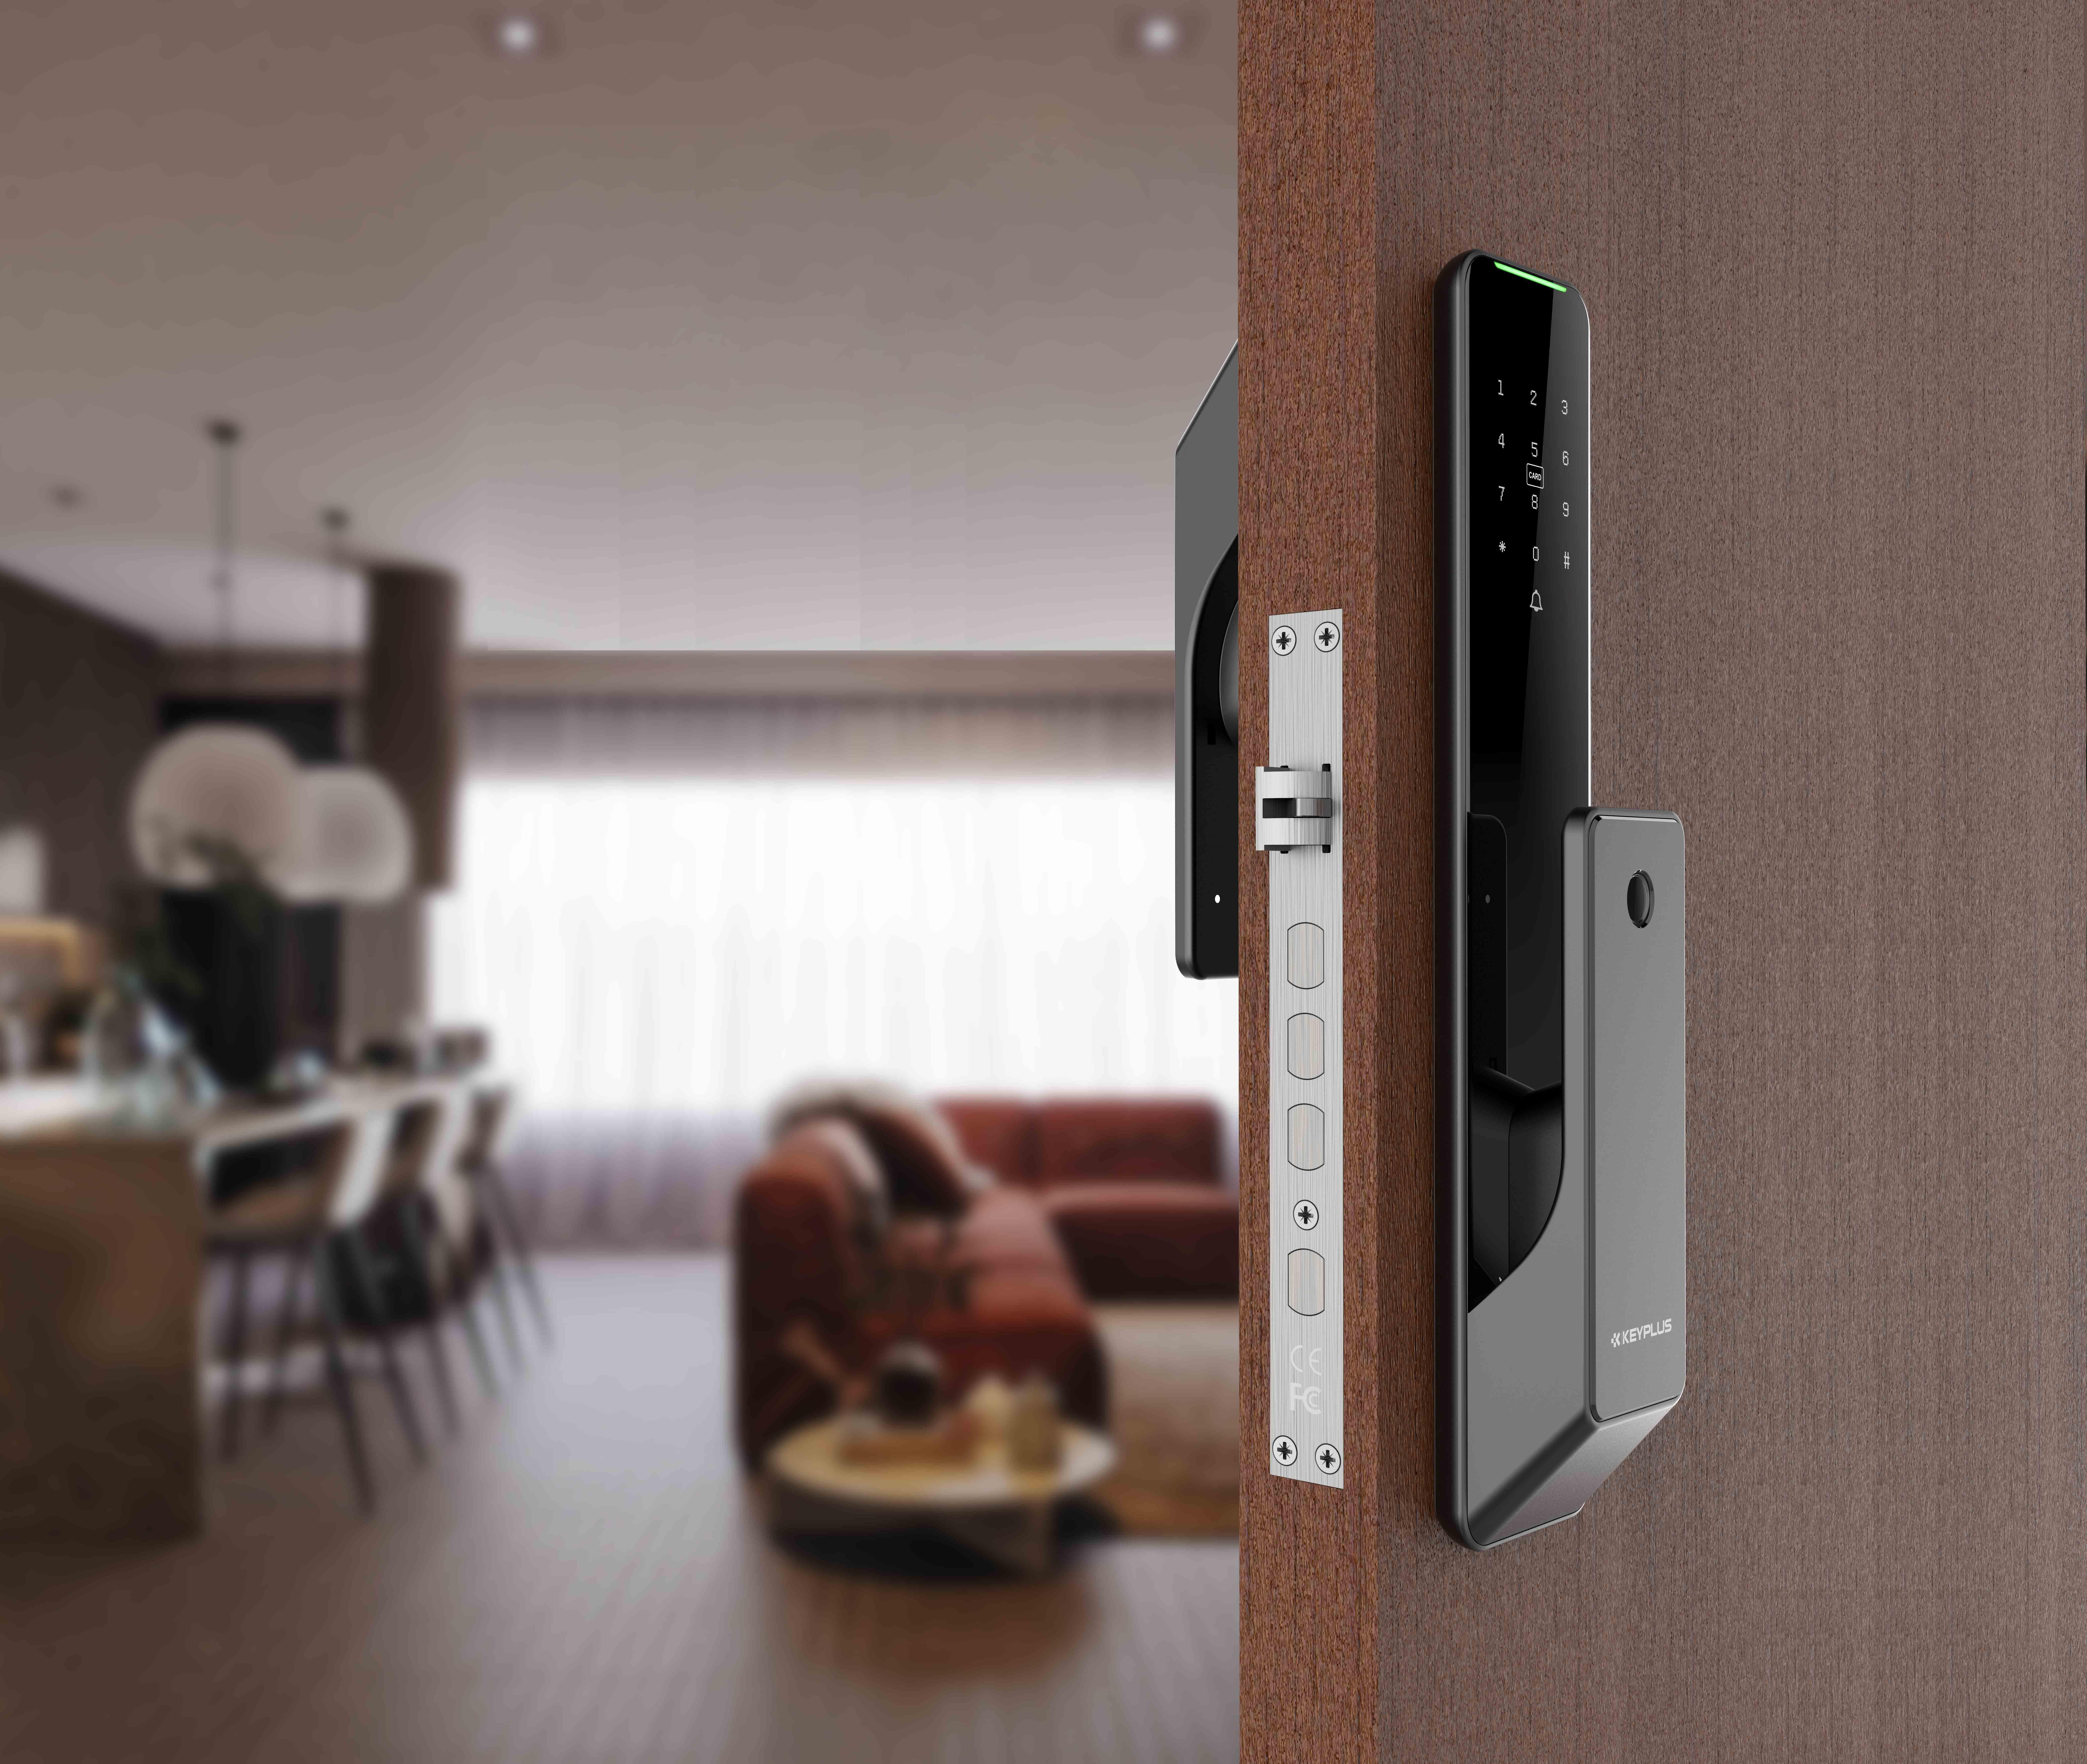 PUSH-PULL Automatic Biometric Fingerprint Digital App Controlled Smart Lock (2)